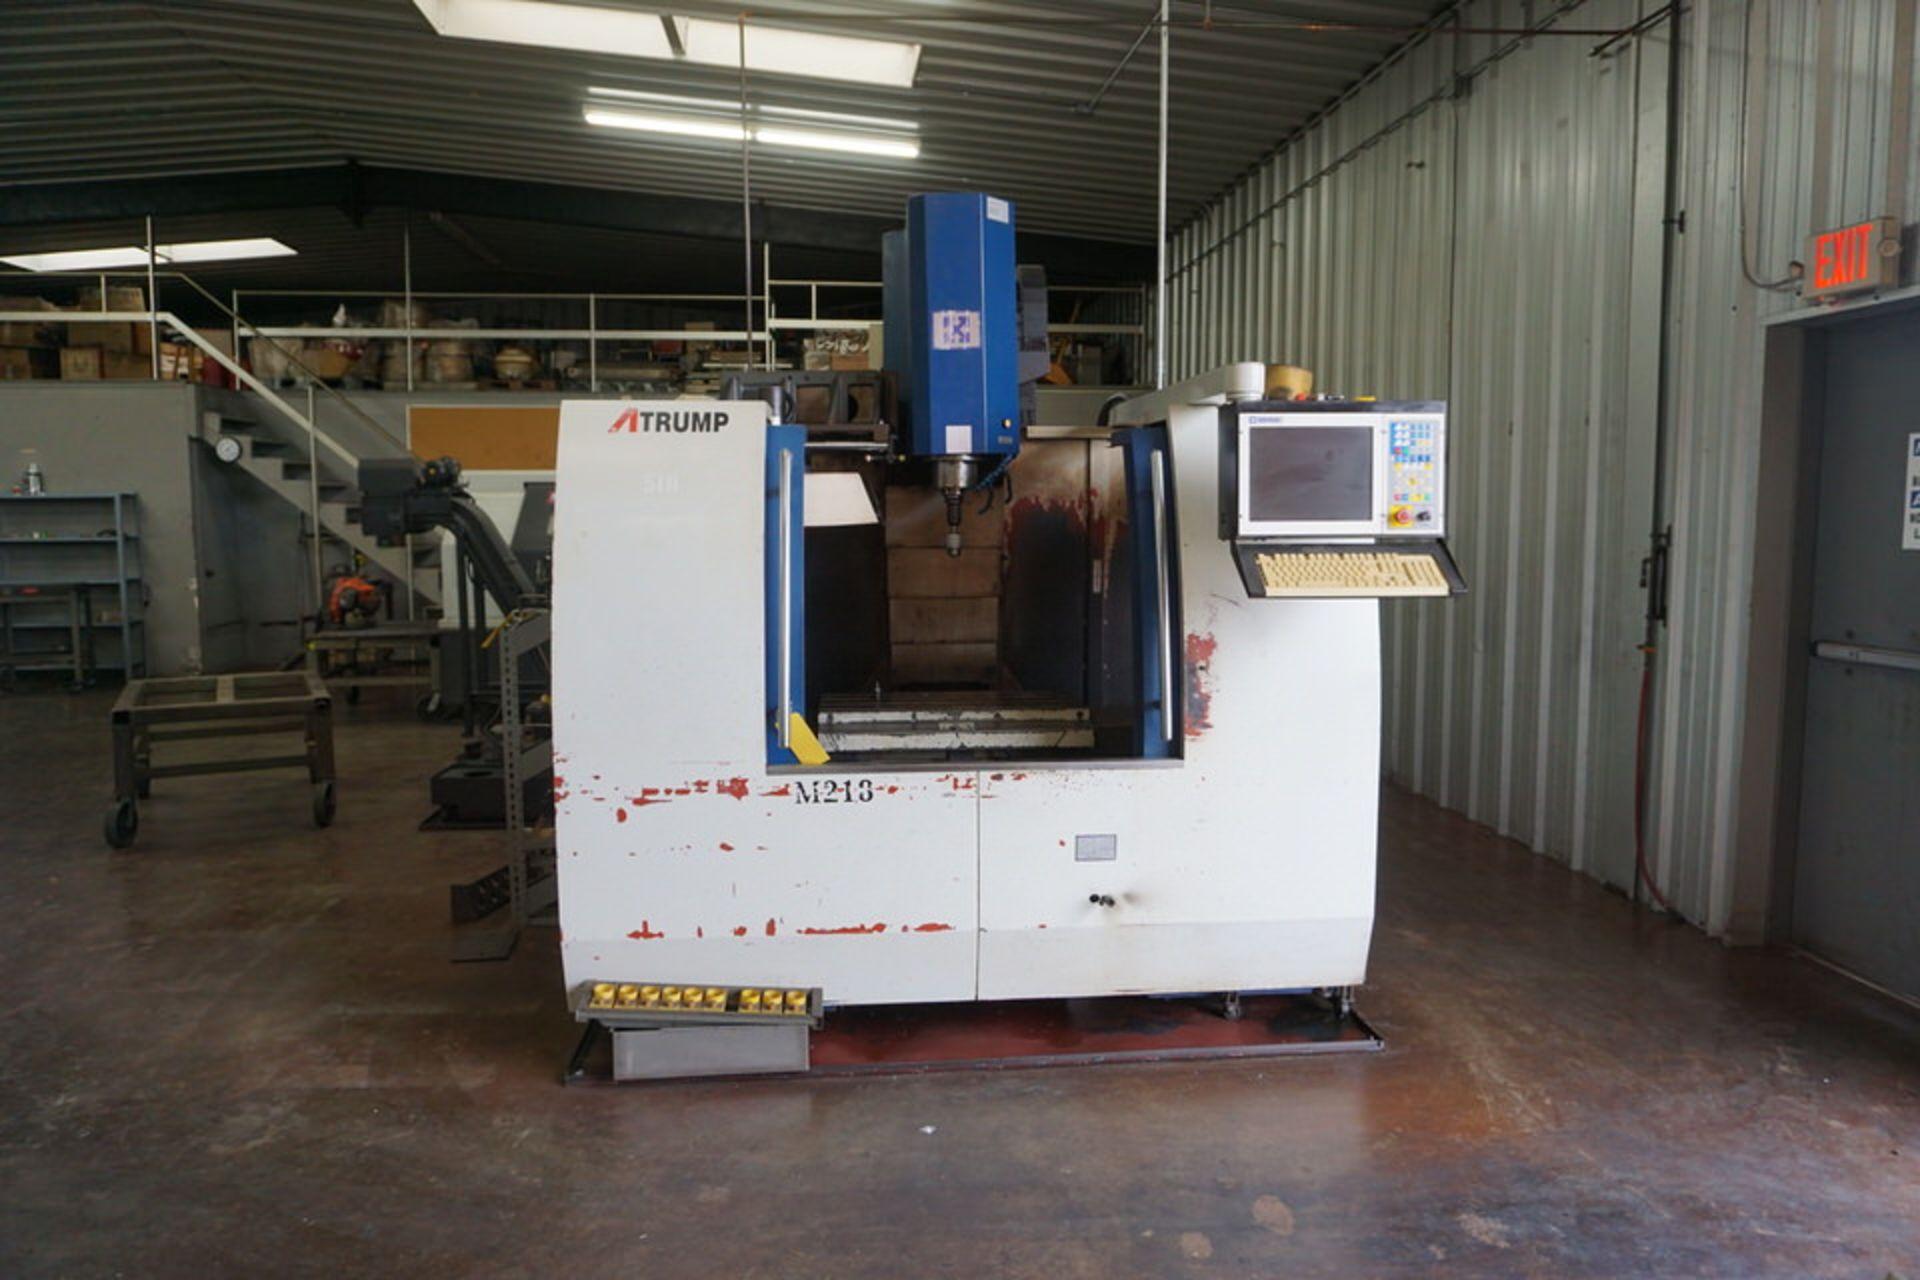 ATRUMP M213 CNC VERTICAL MACHINING CENTER W/ CENTROID CONTROL